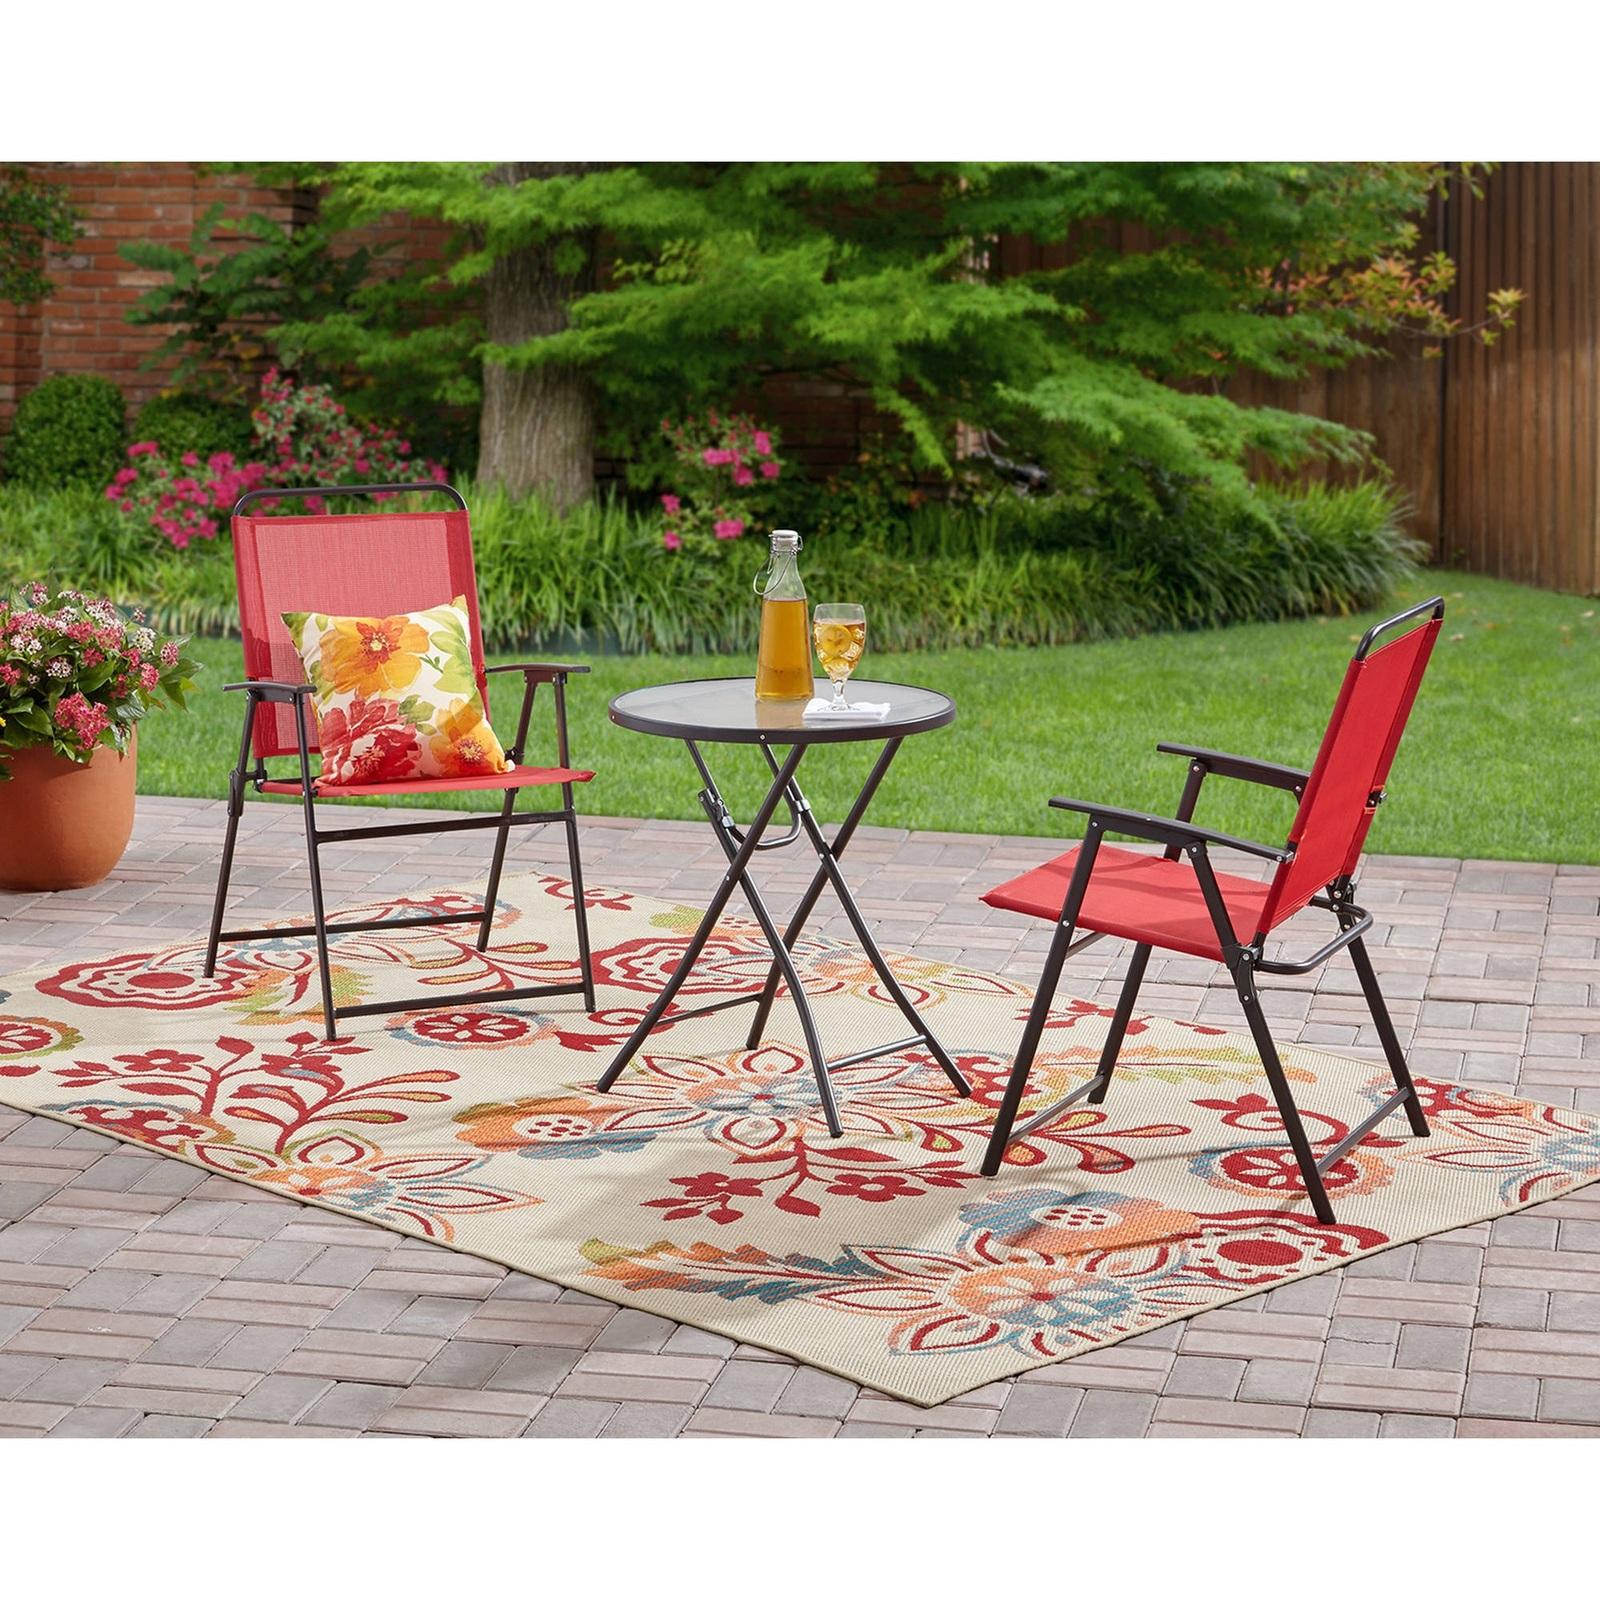 Outdoor patio bistro set 3 piece garden cafe backyard yard folding chairs red